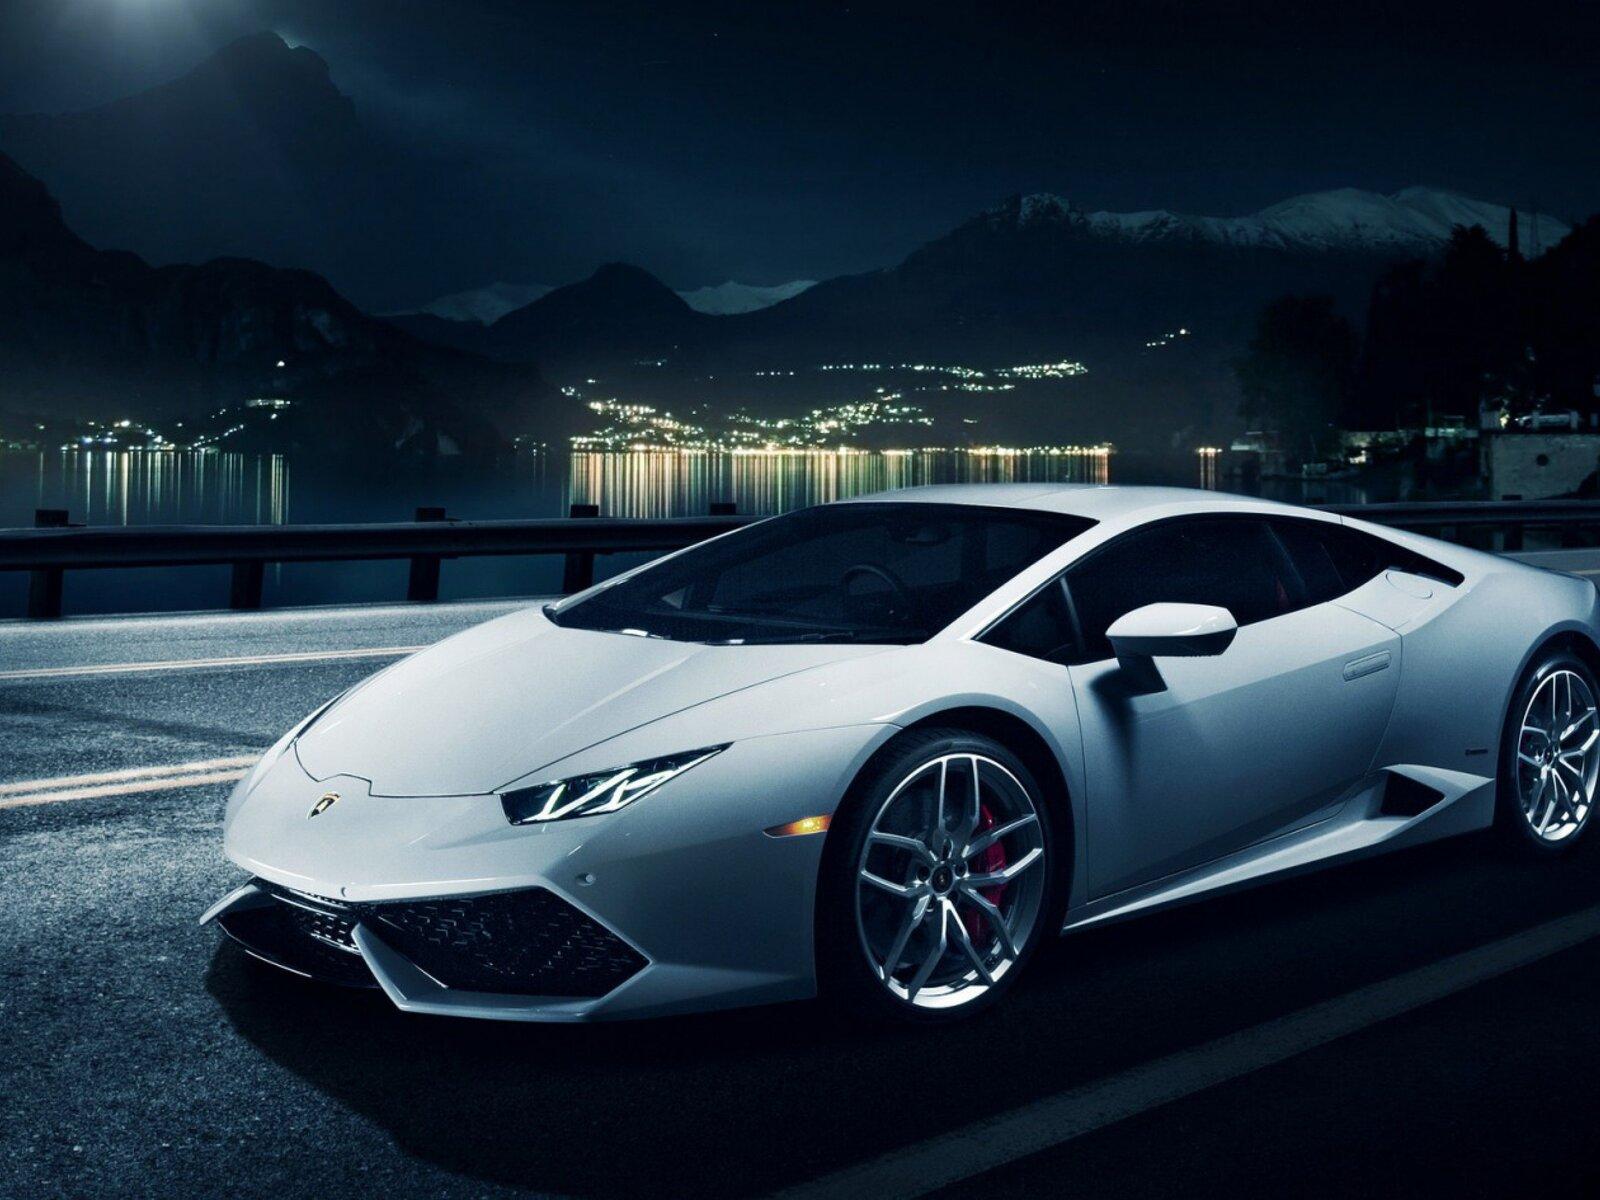 1600x1200 Lamborghini Huracan Hd 1600x1200 Resolution Hd 4k